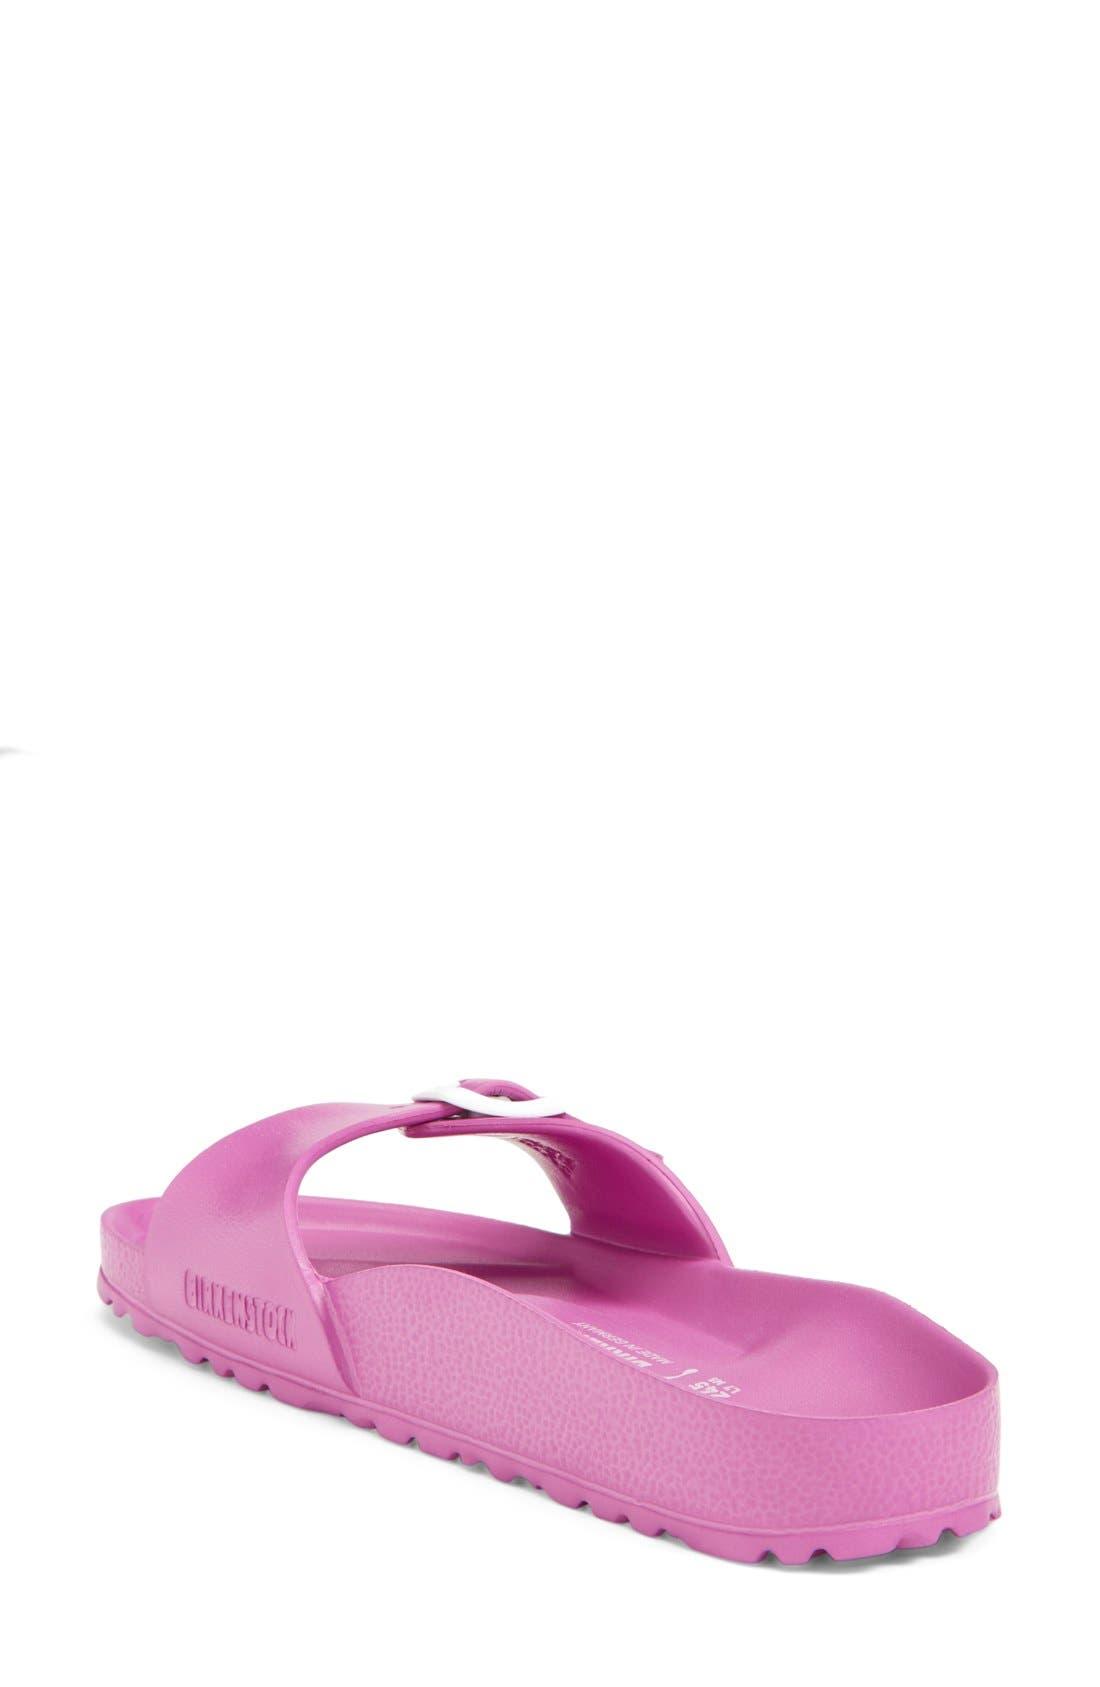 'Essentials - Madrid' Slide Sandal,                             Alternate thumbnail 2, color,                             Pink